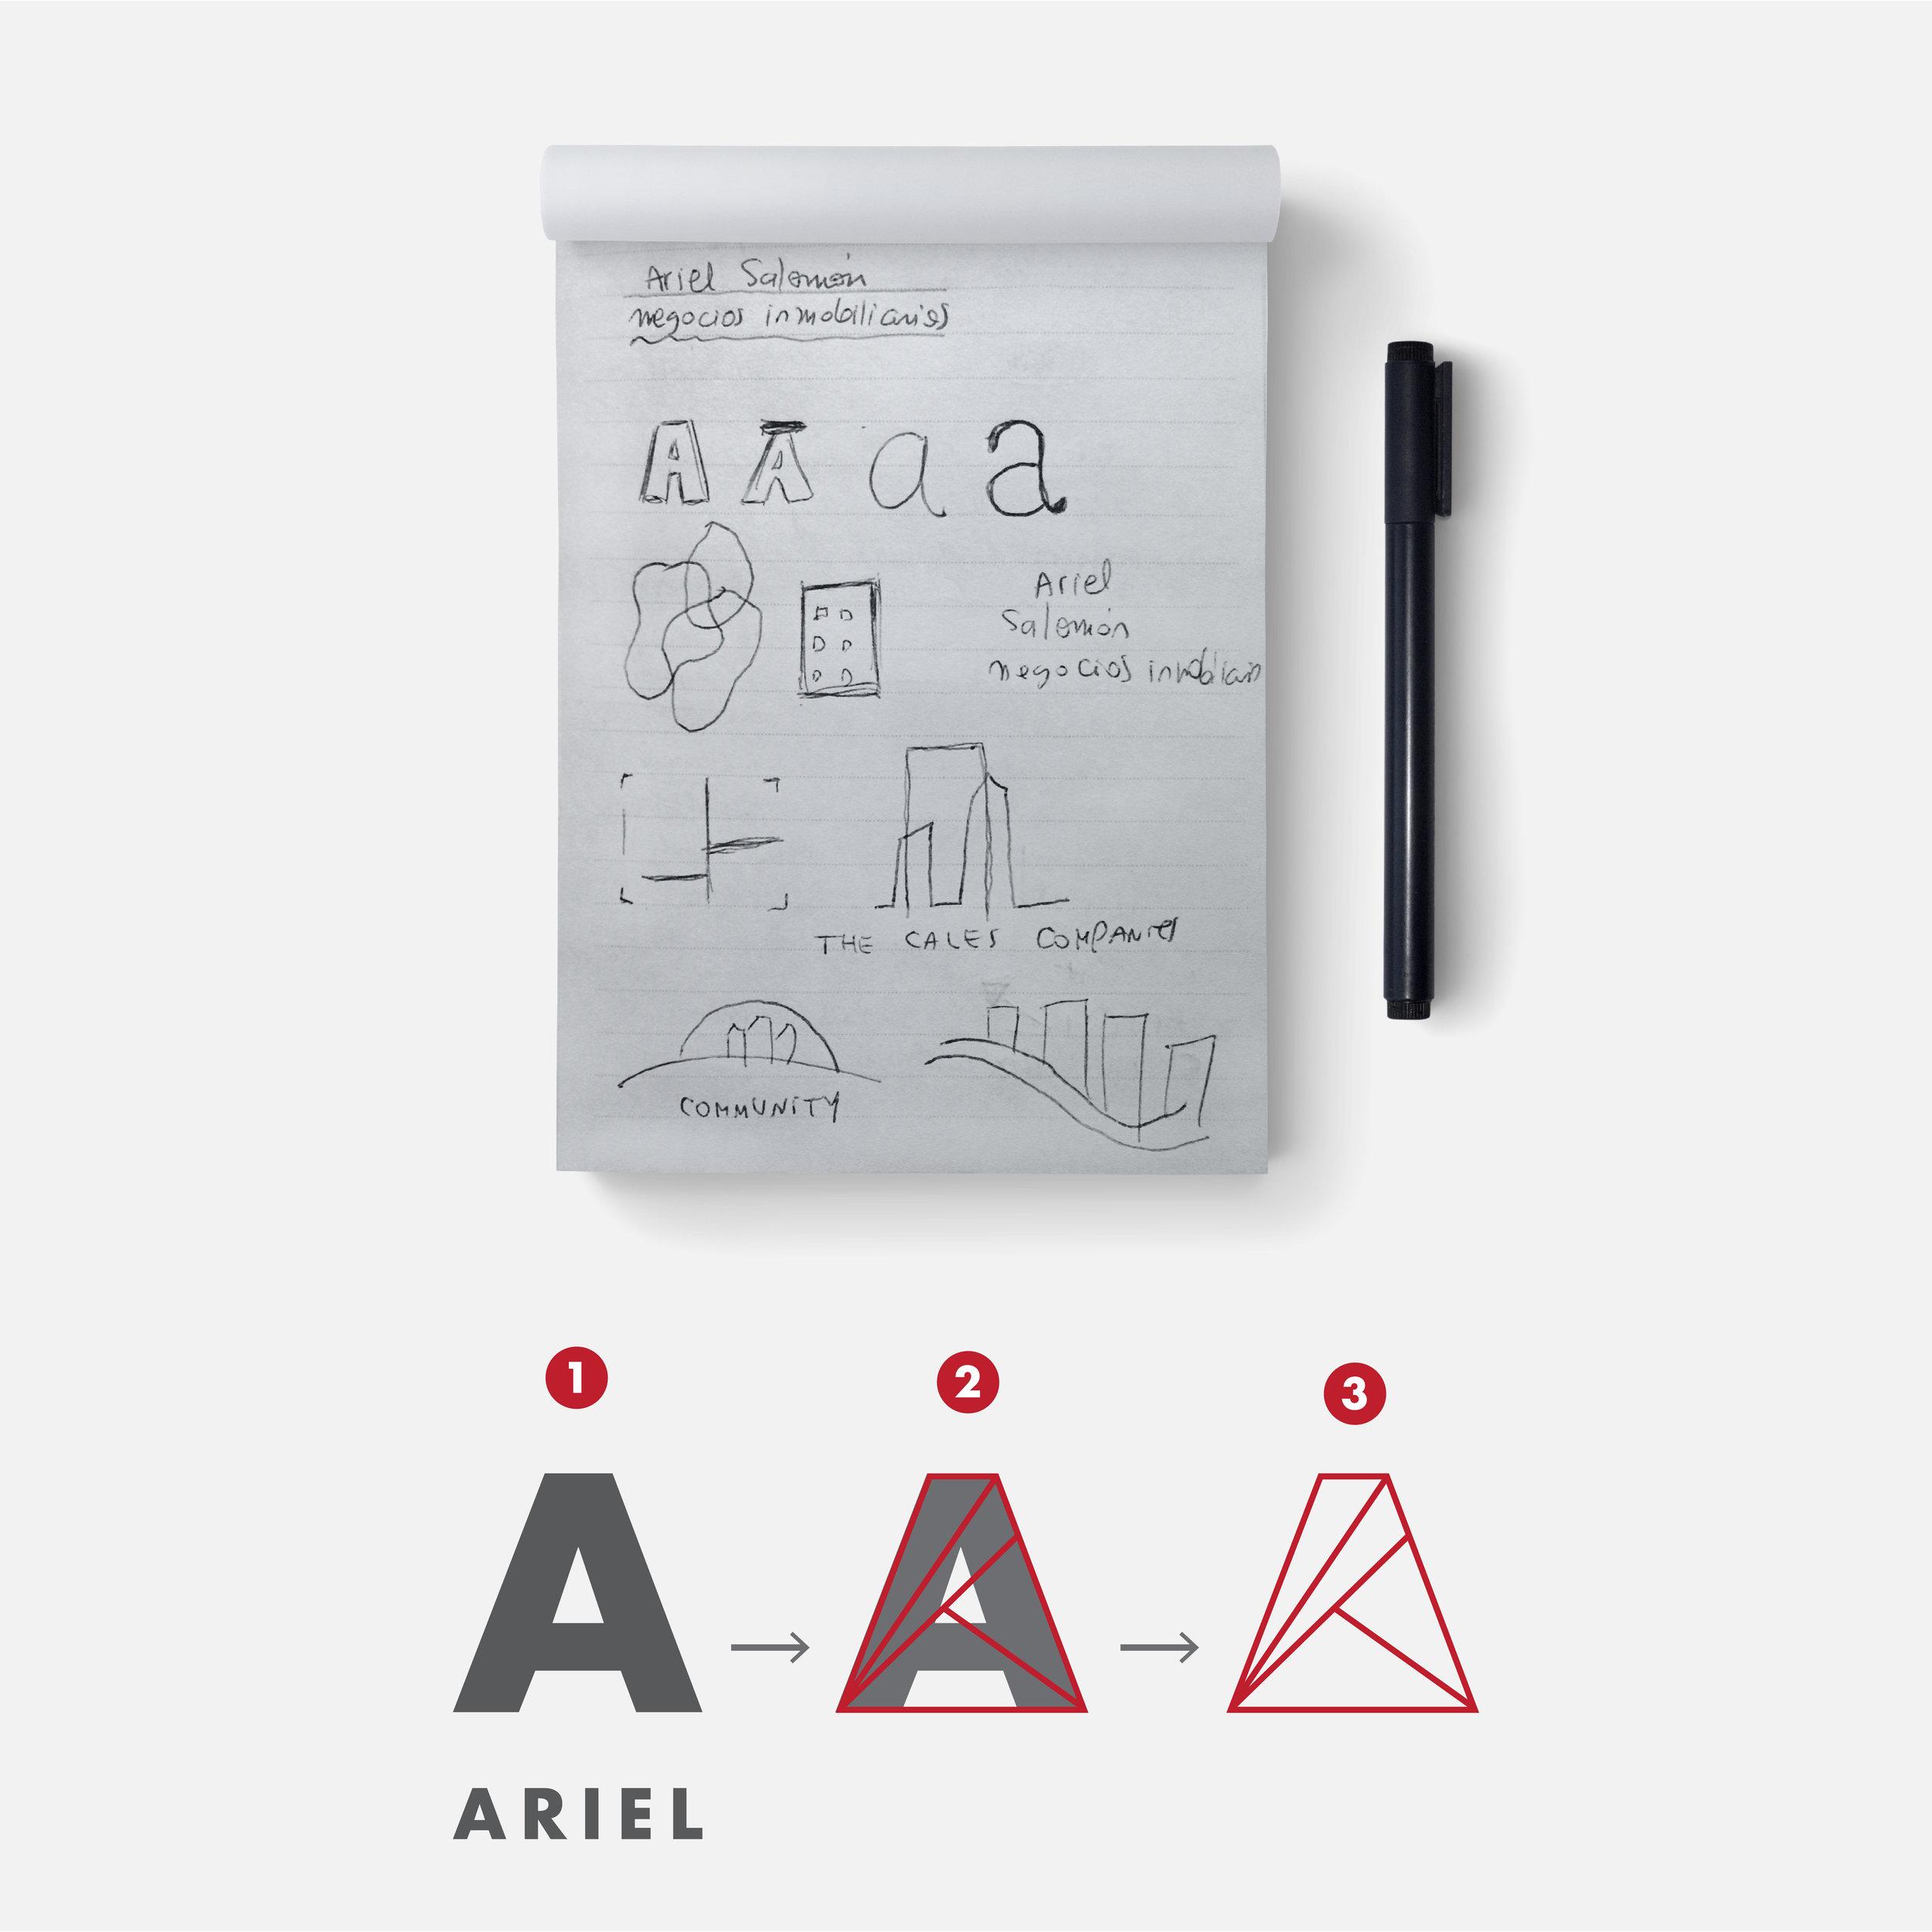 Ariel_Salomon_Branding_NOTAG-02.jpg